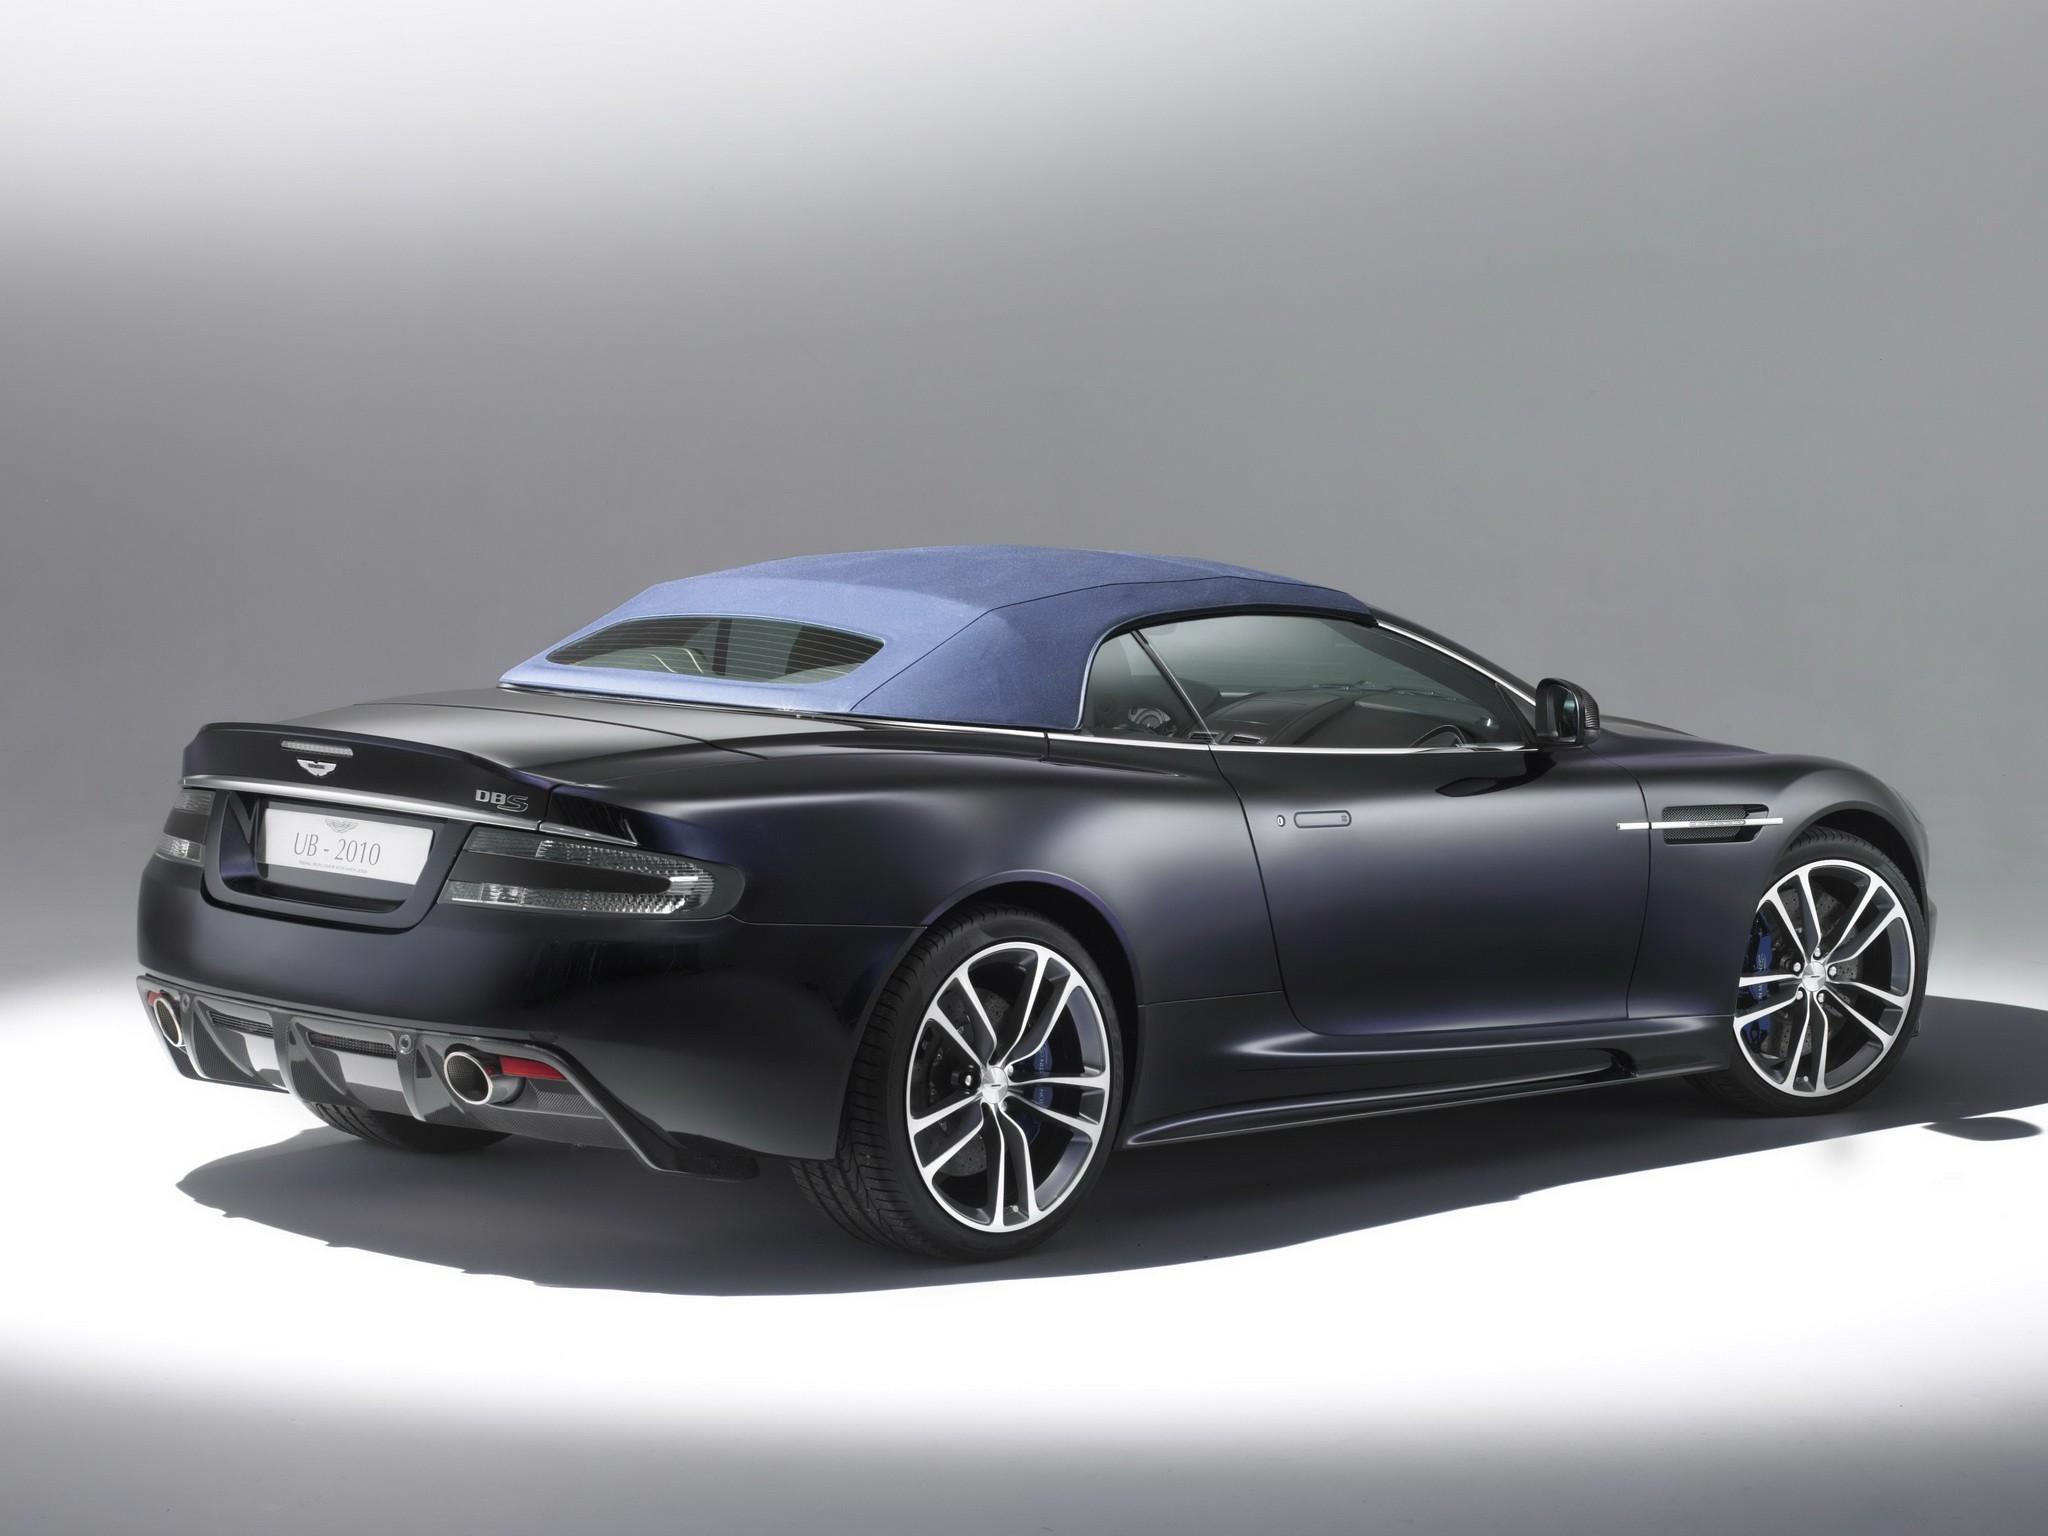 Aston Martin DBS Volante - 30 August 2017 - Autogespot  |Aston Martin Dbs Volante